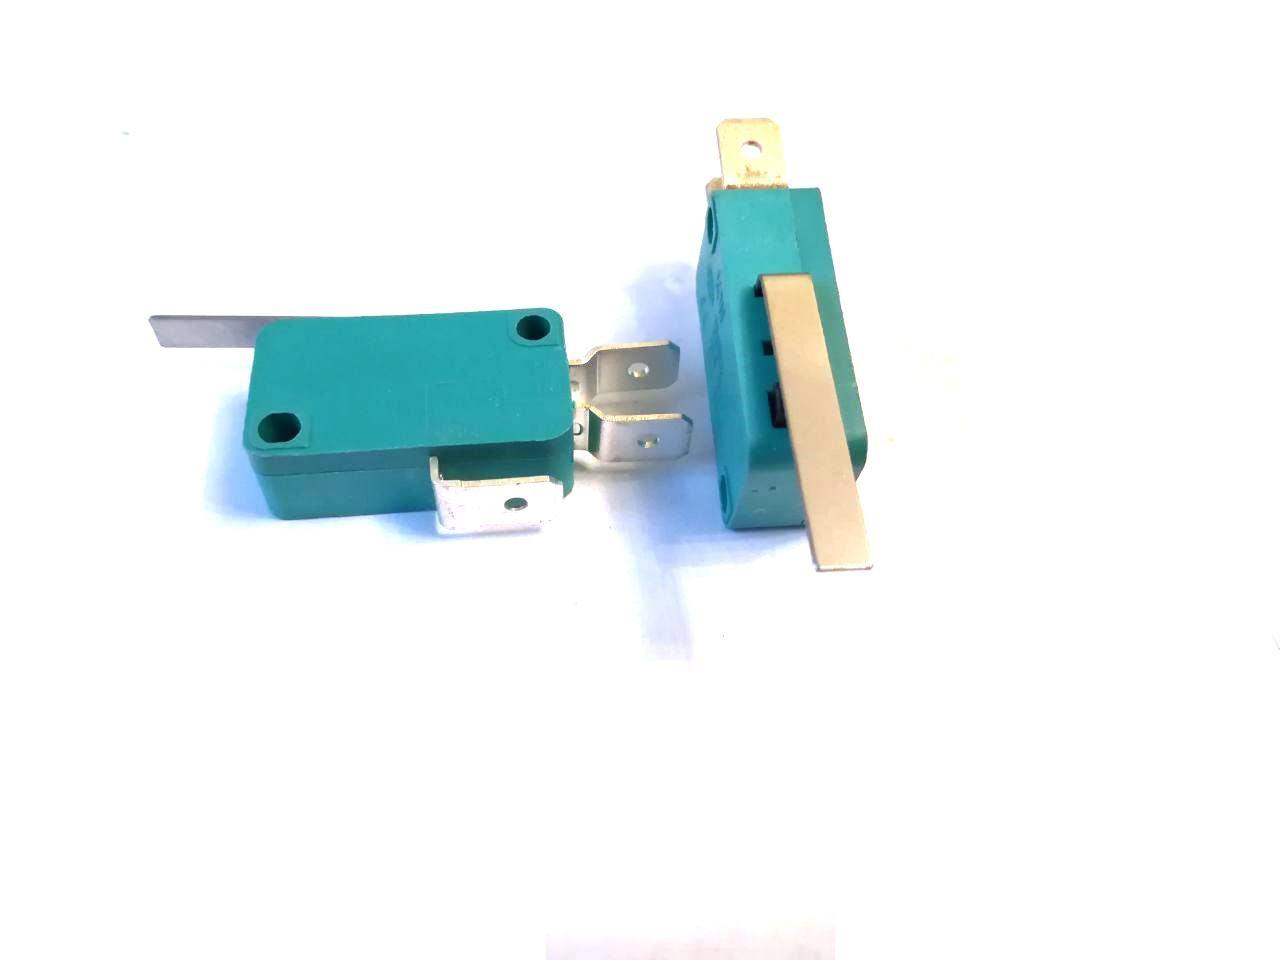 Микропереключатель 1E4 T125 Рычаг 27мм / 250V / 16A